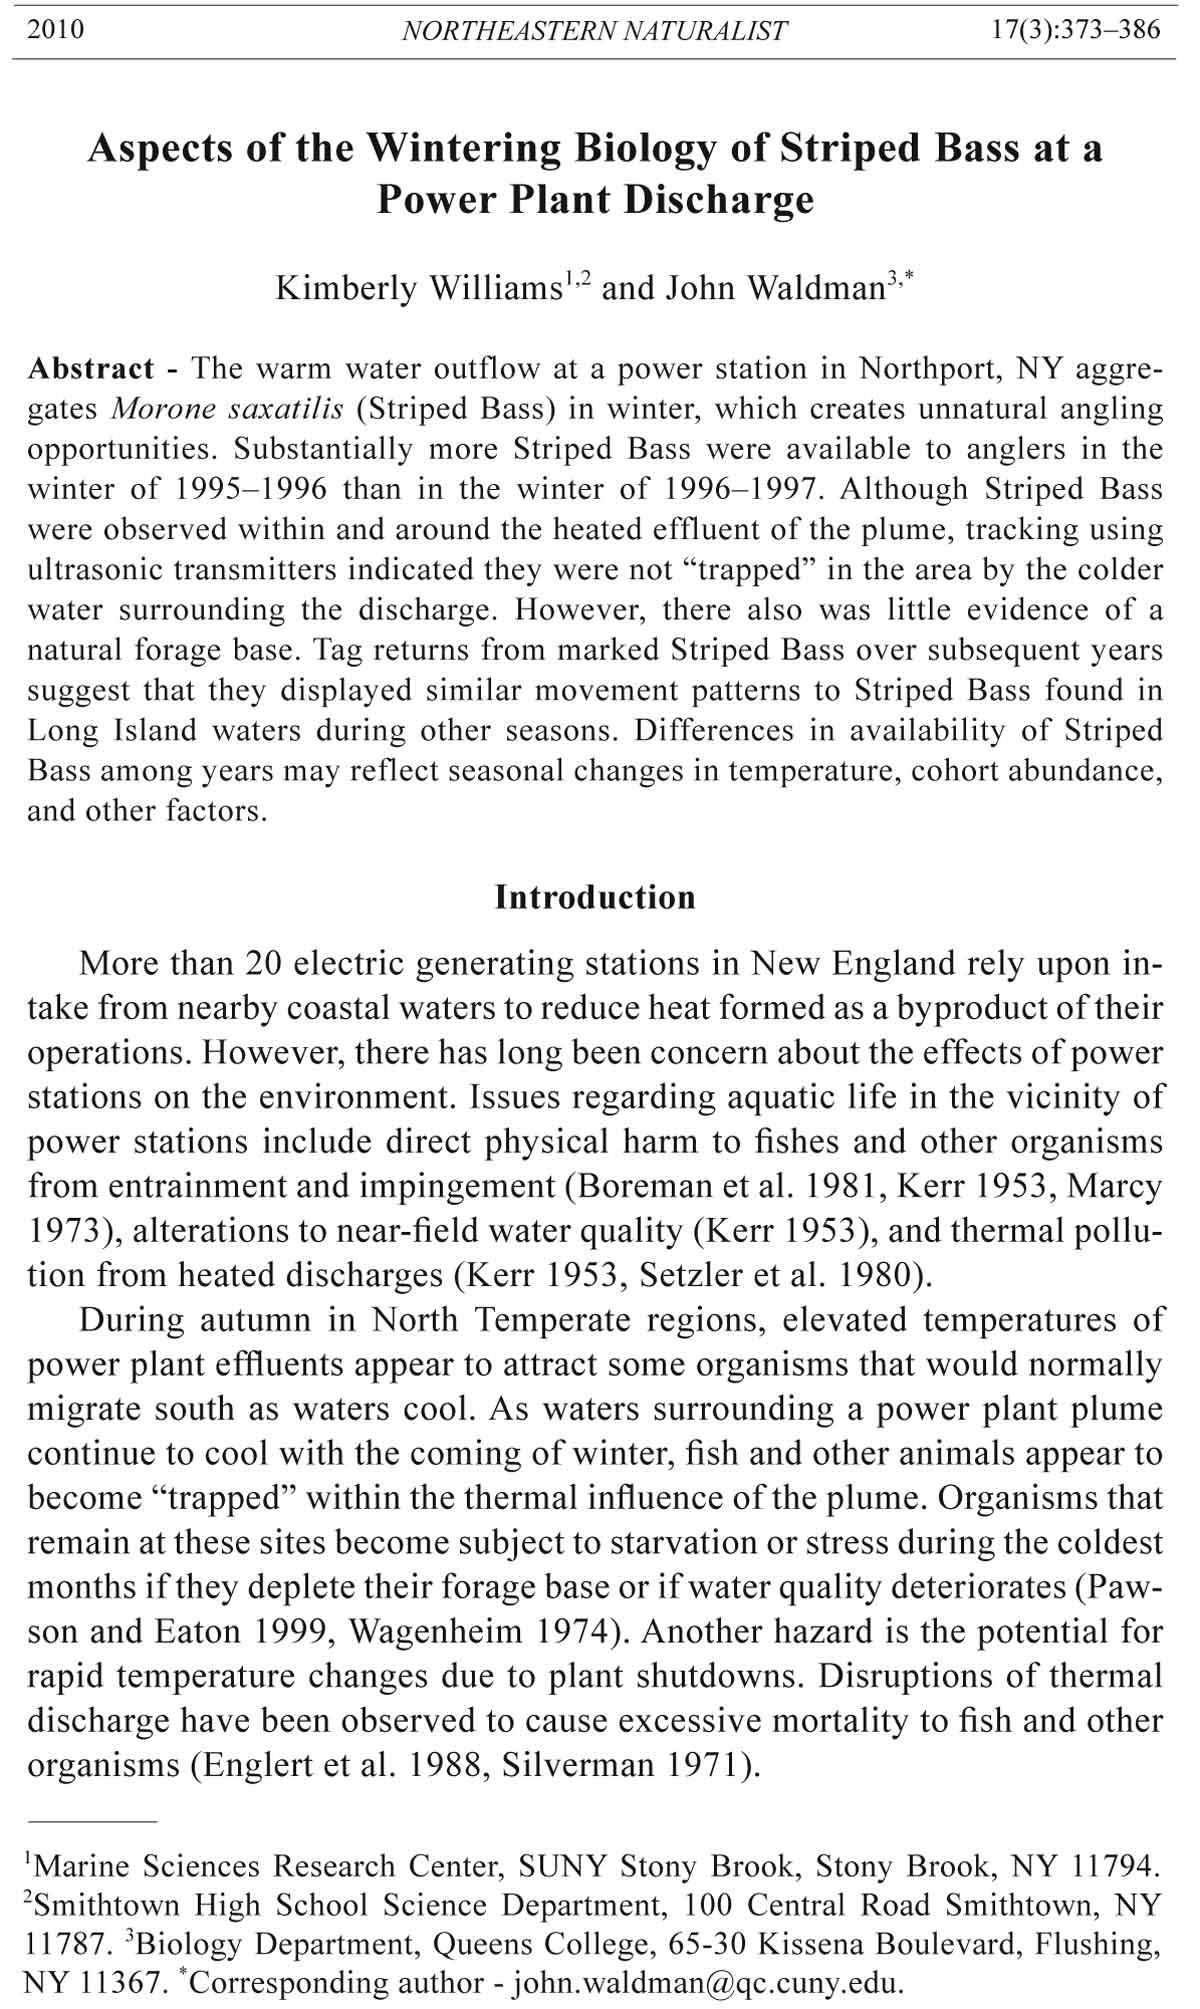 Northeastern Naturalist, Volume 17, Number 3 (2010): 373–386